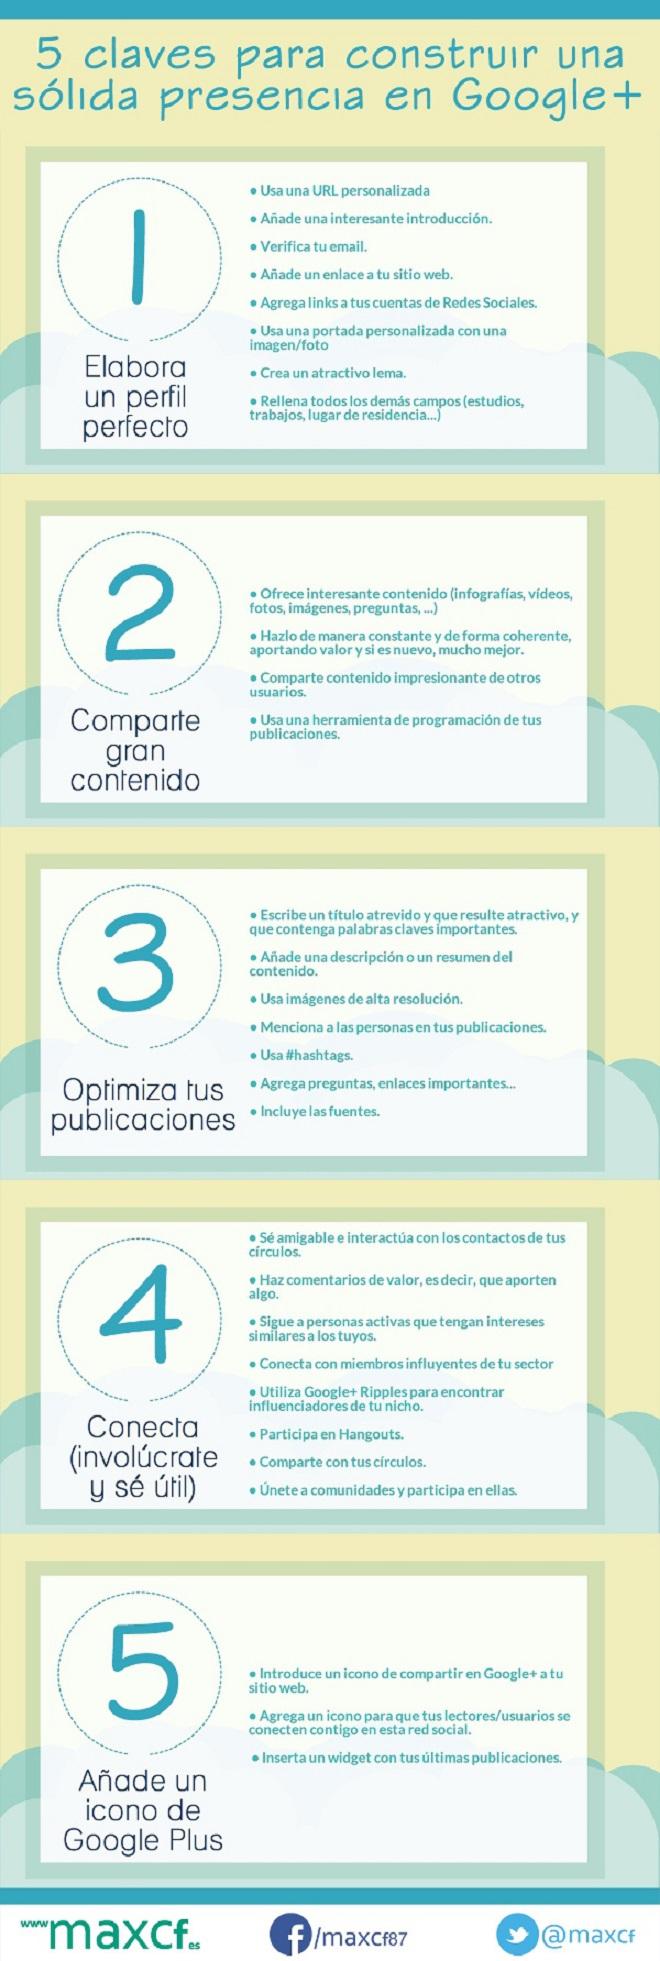 infografia_5_claves_presencia_google_